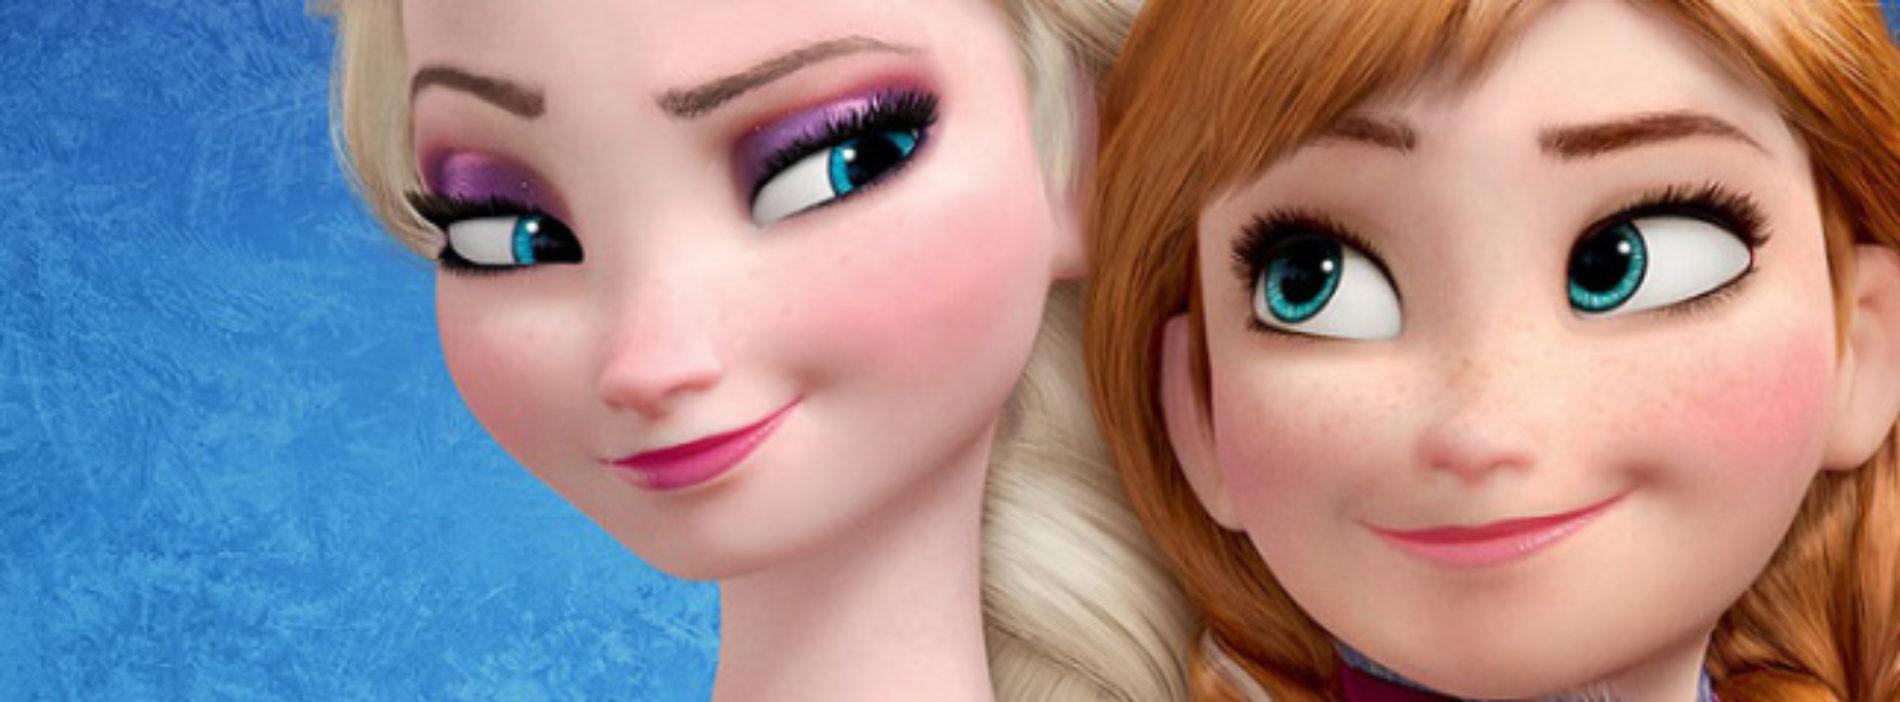 """Frozen"" Progress in Gay Rights"